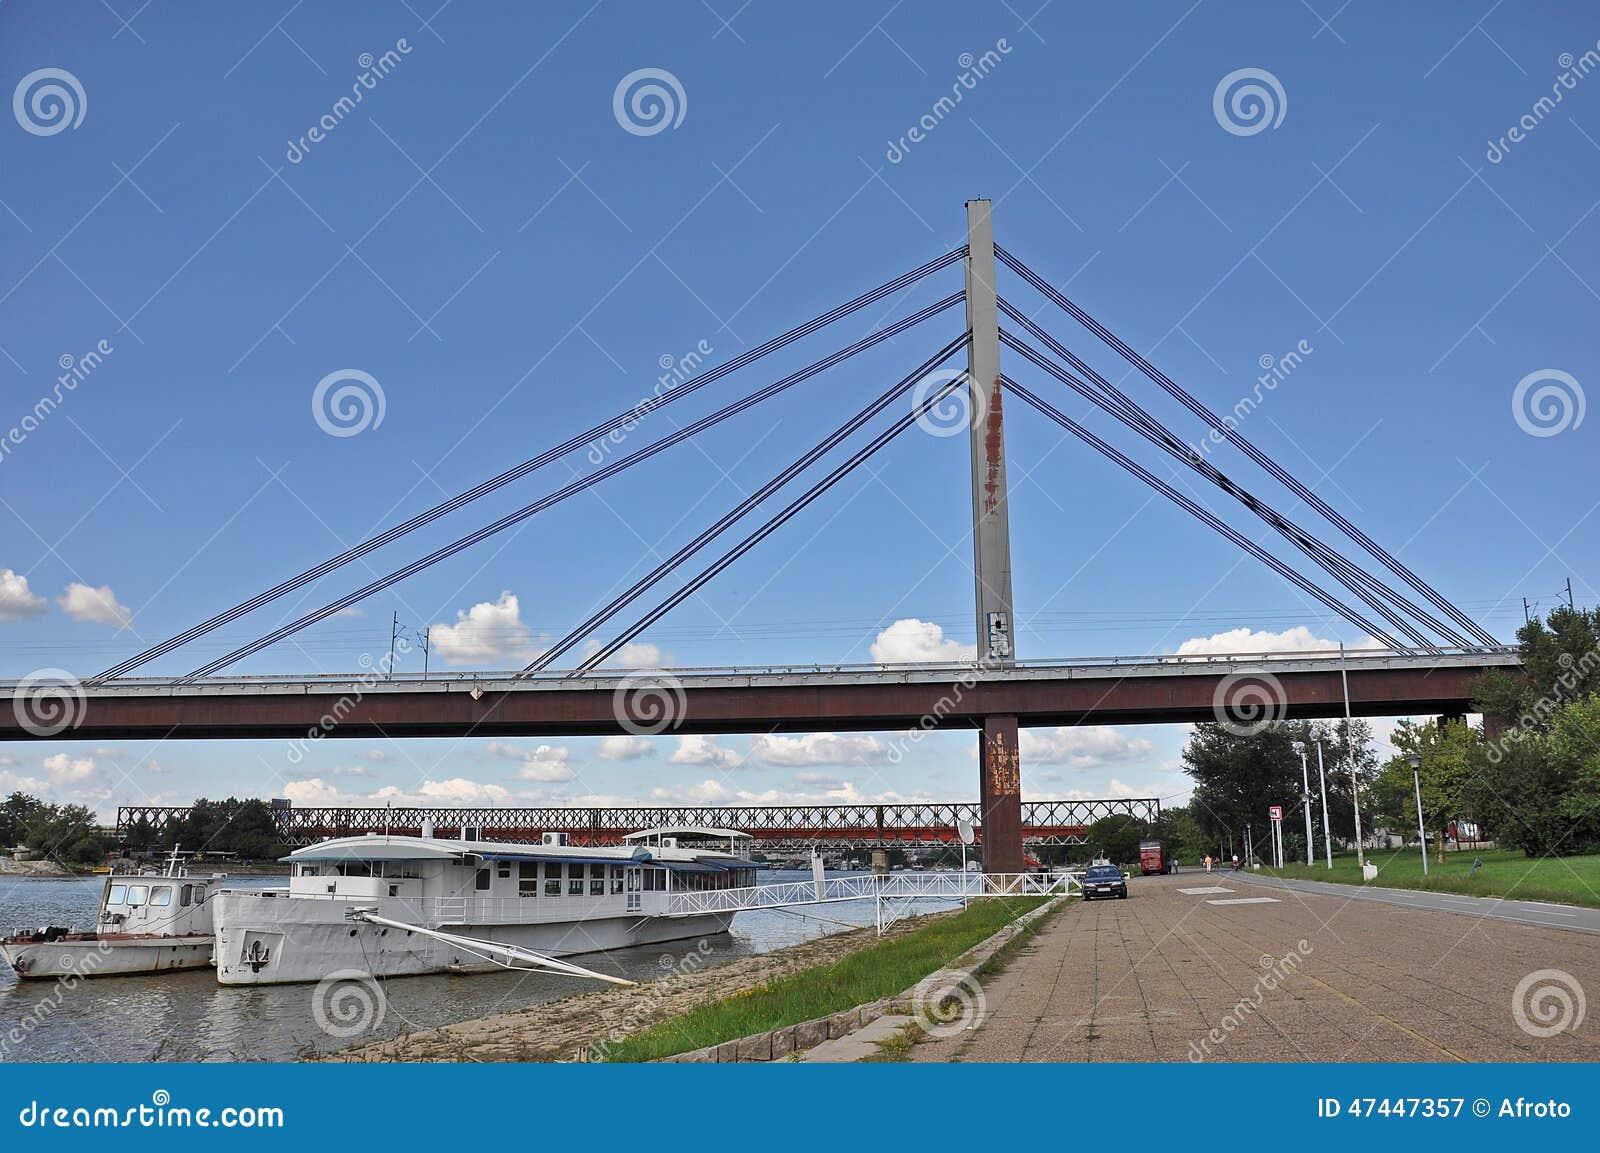 City bridge with a boardwalk